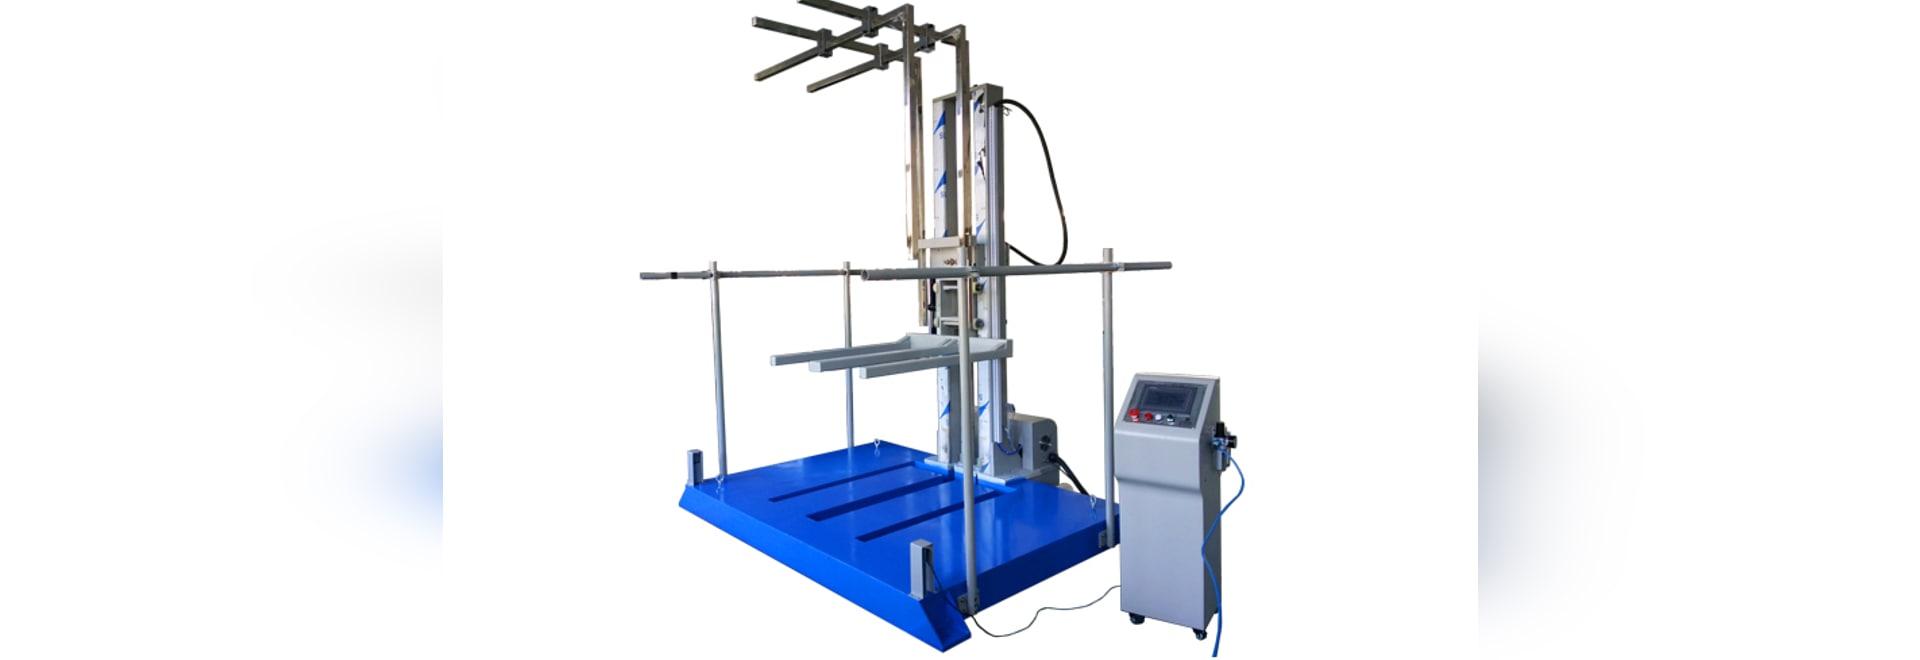 zero drop testing machine